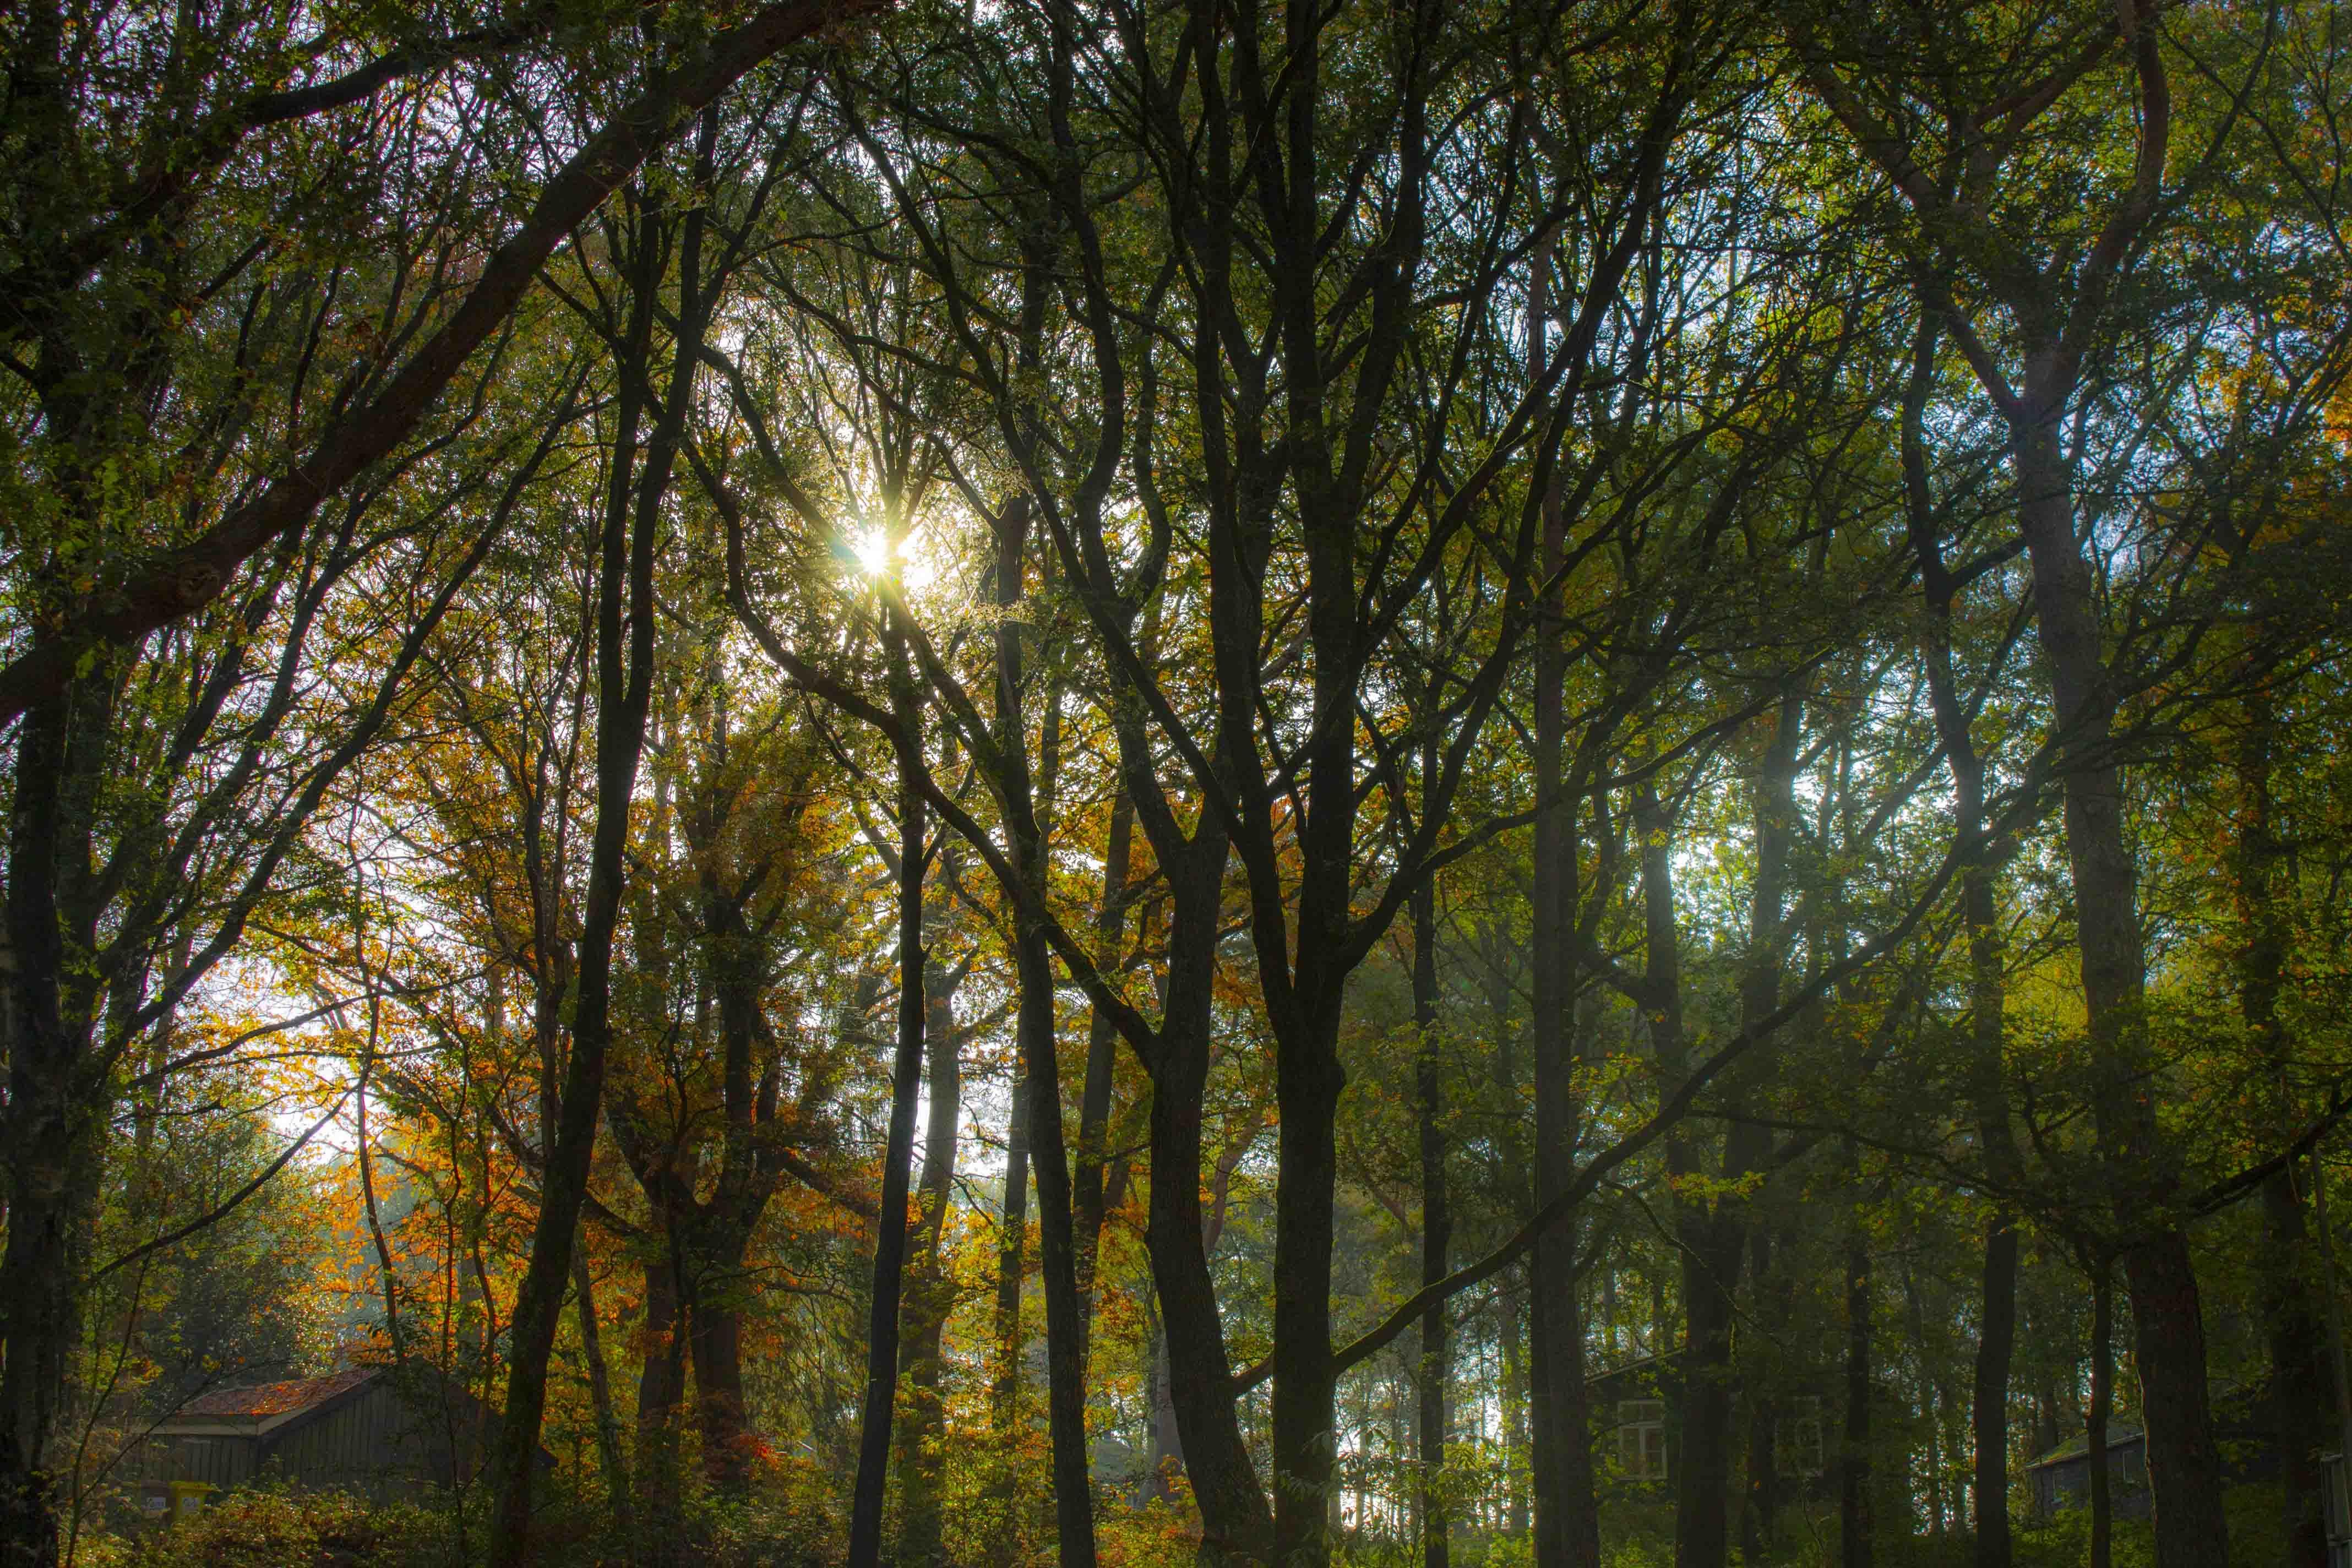 Herfst in het Drentse bos